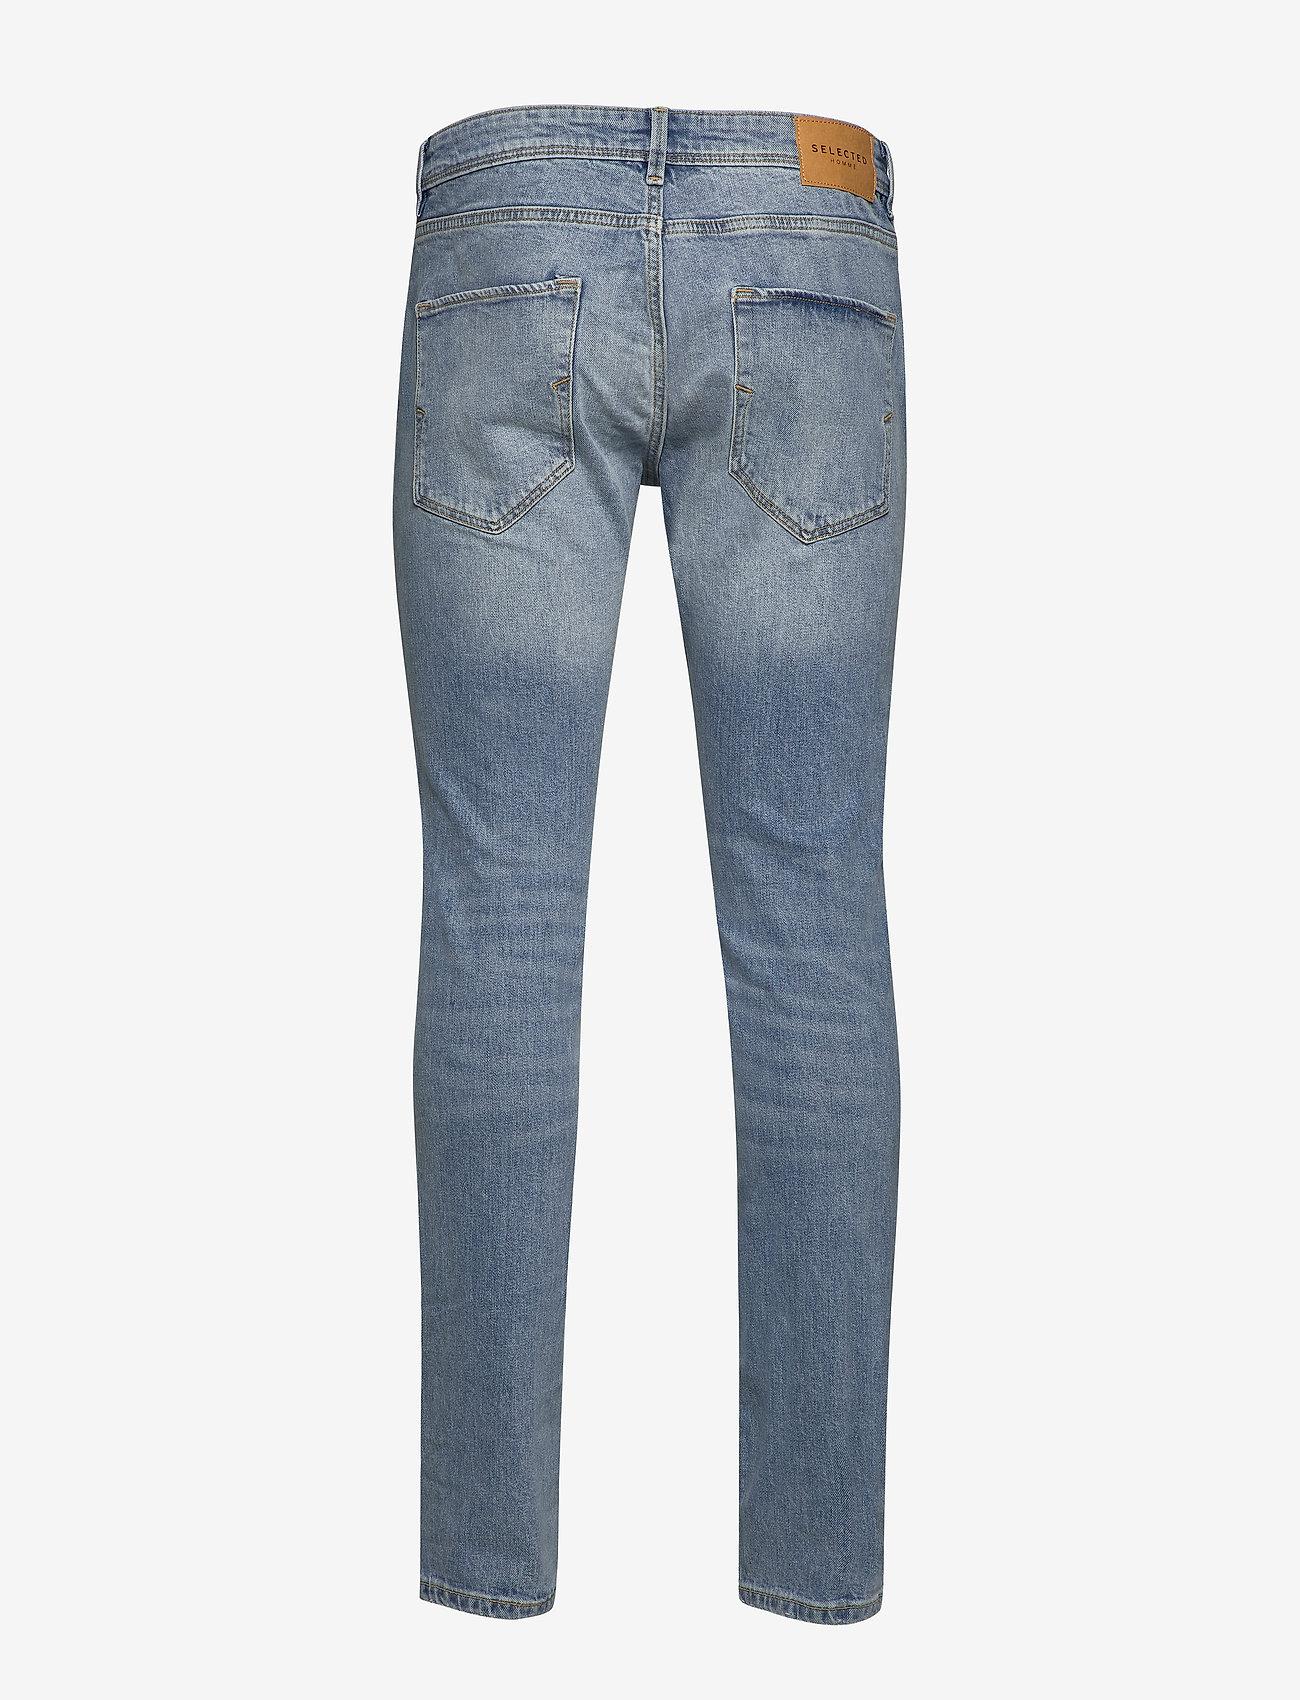 Selected Homme - SLHSLIM-LEON 3020 L.BLUE ST JEANS W NOOS - slim jeans - light blue denim - 1